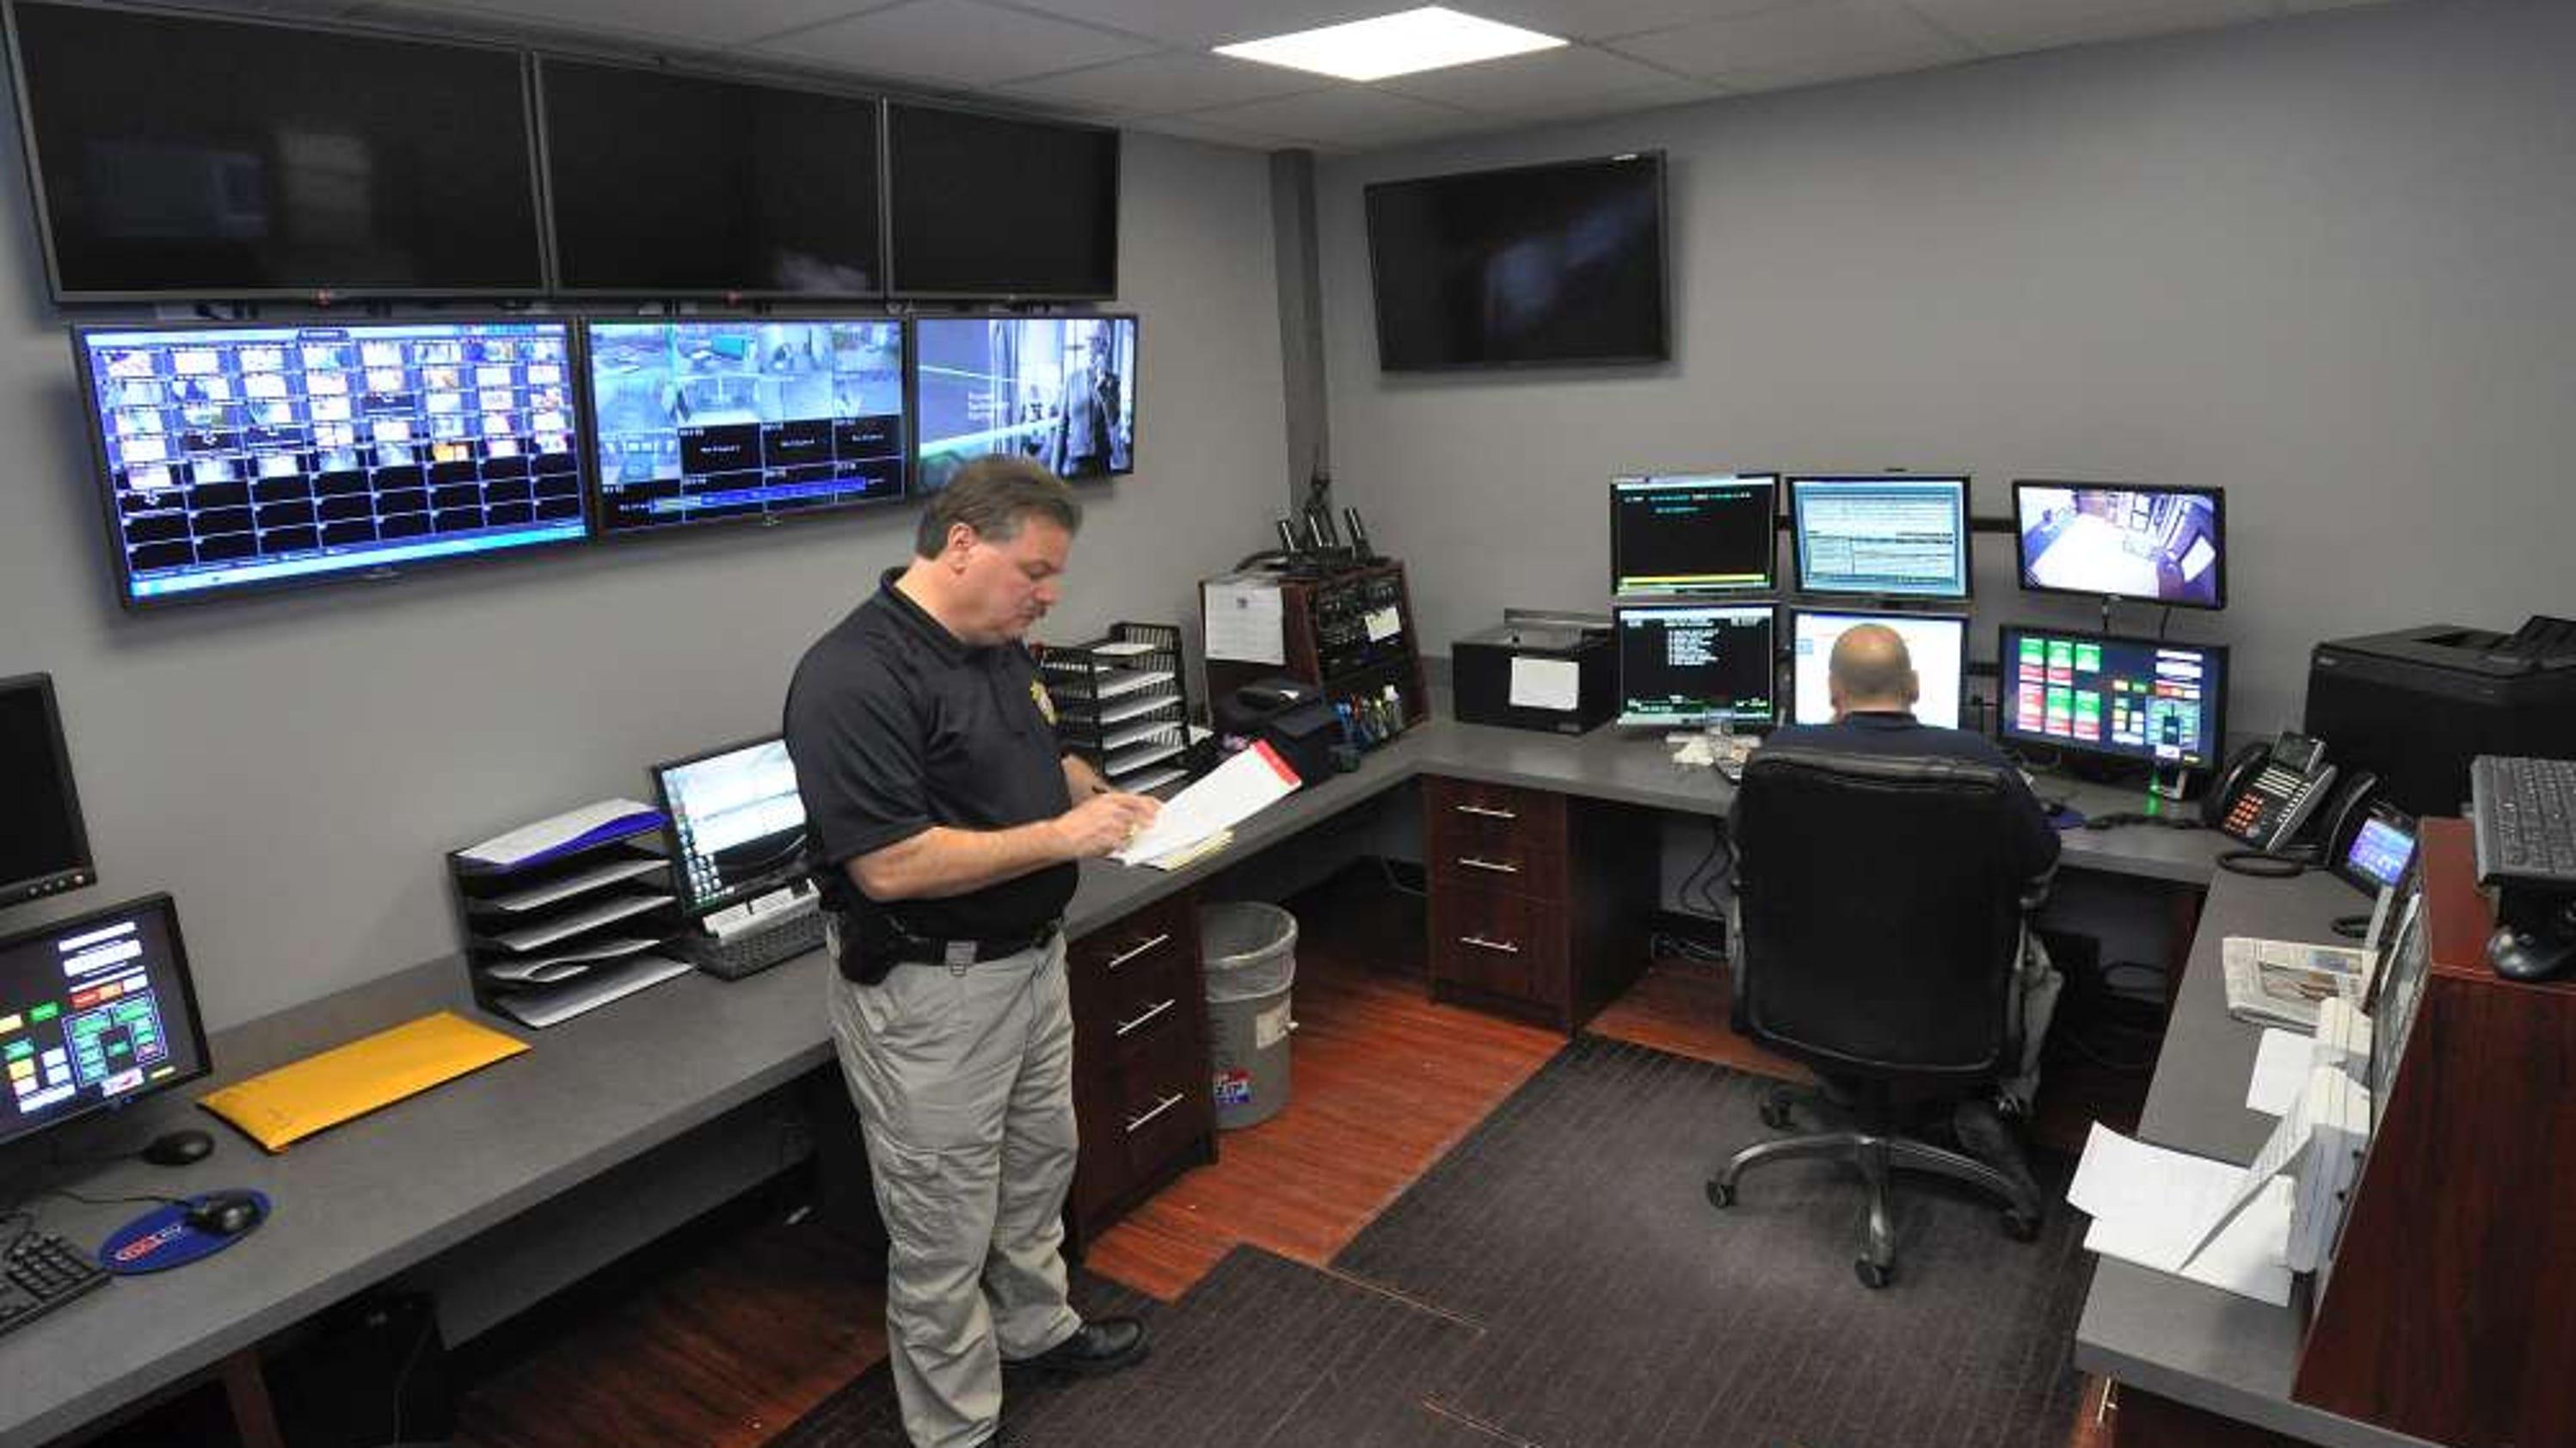 Woodland park nj police chief retires abruptly - Garden city michigan police department ...